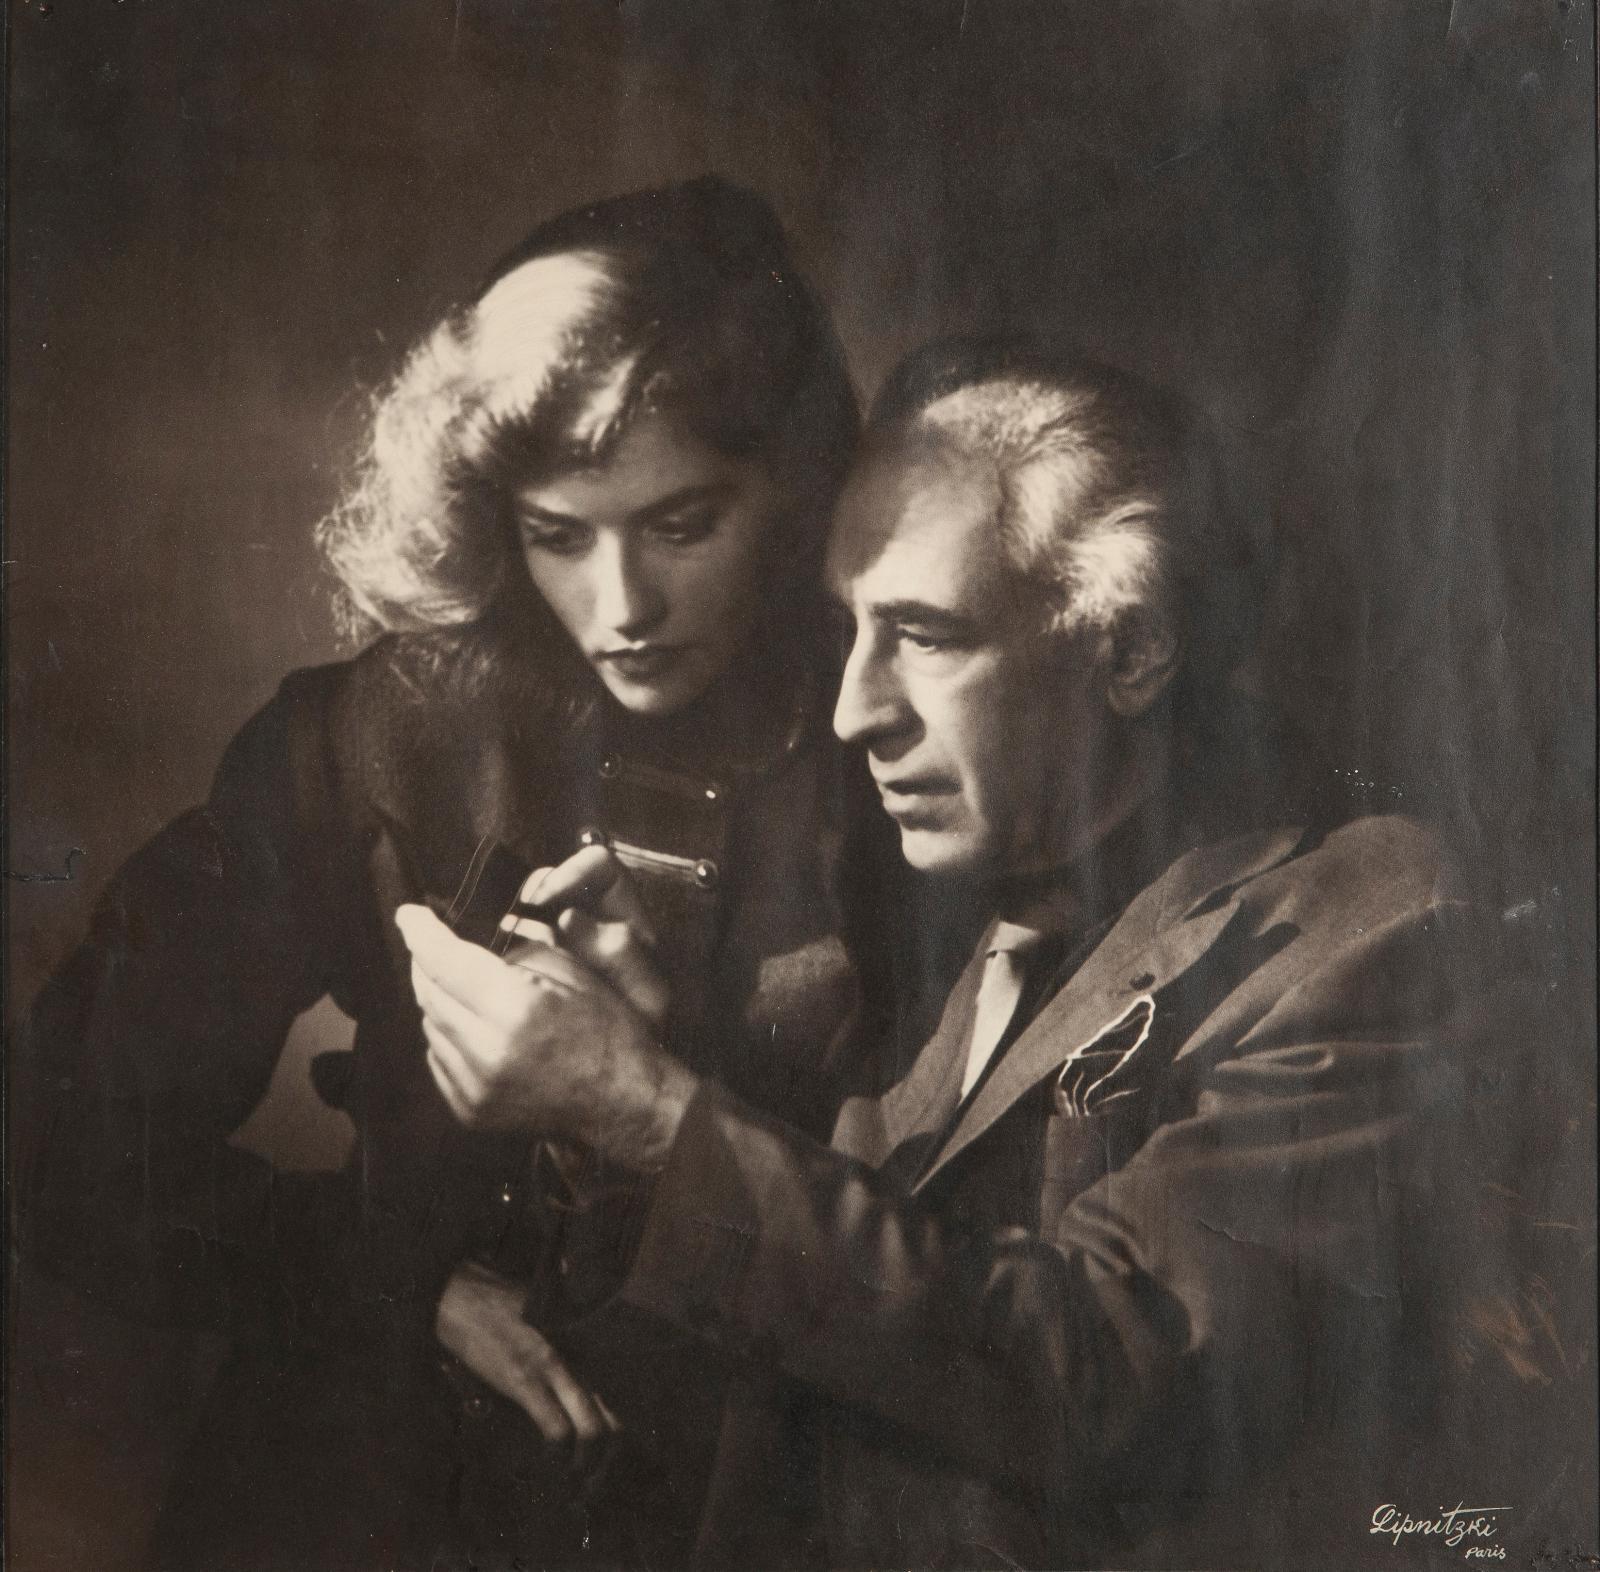 Boris Lipnitzki (1887-1971), Abel Gance and Nelly Kaplan, Roger-Viollet Agency.Estimate: €150/200